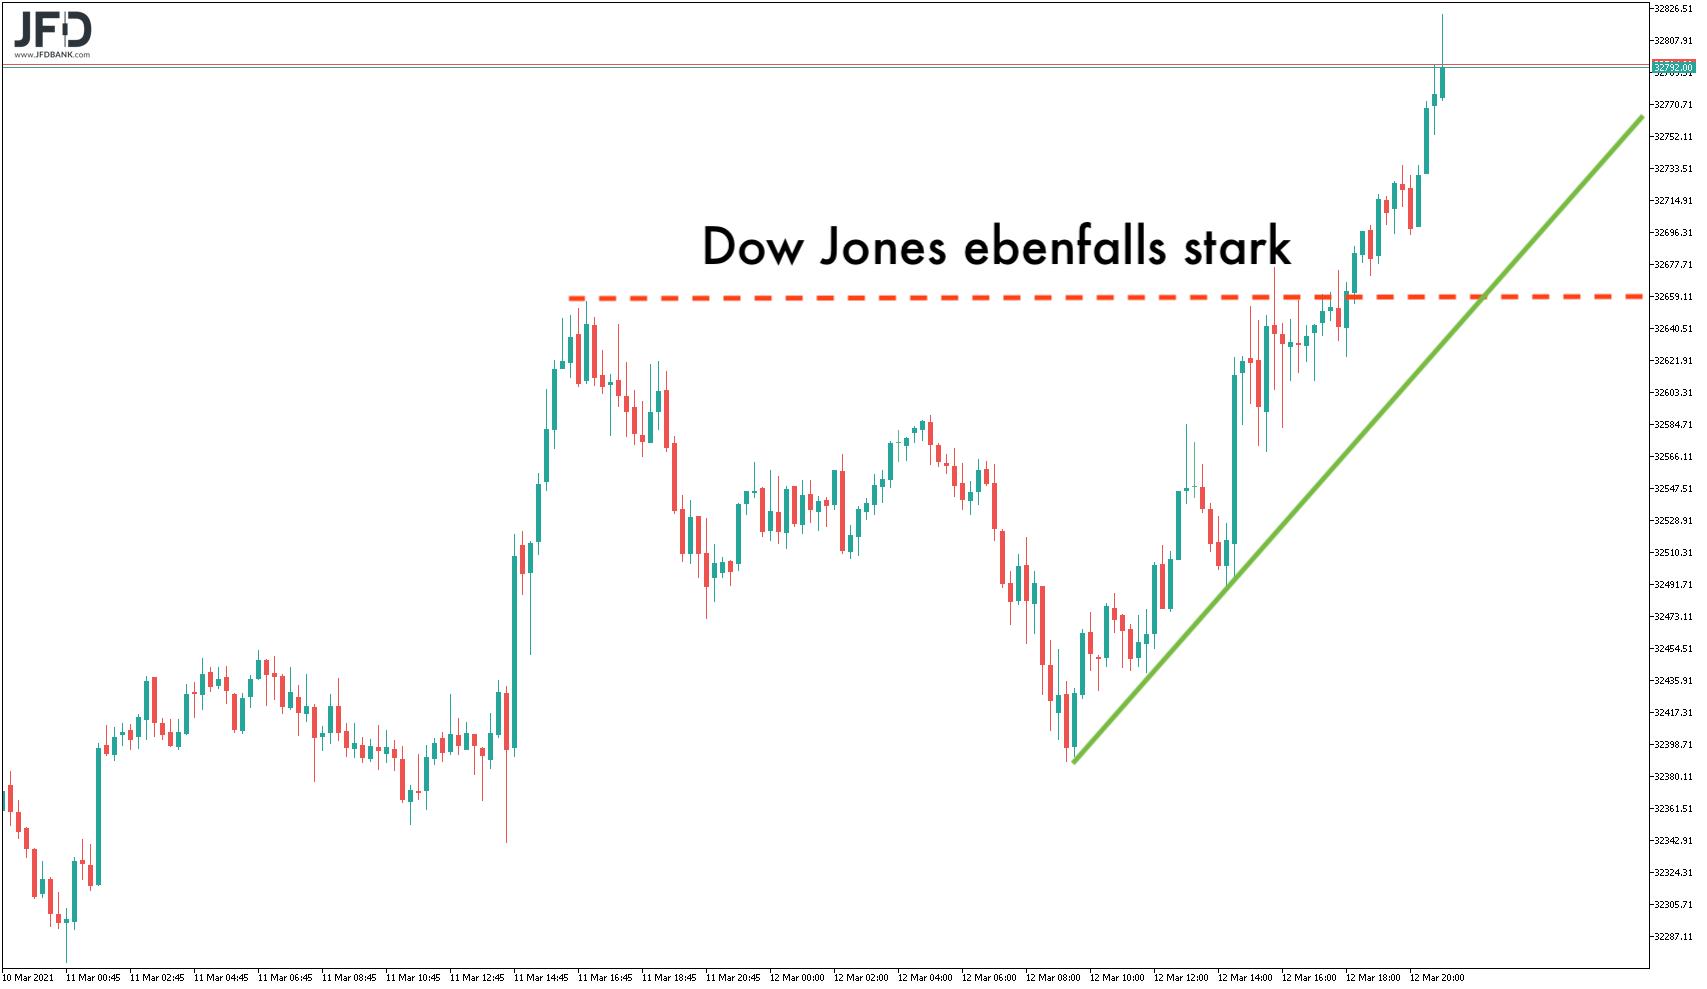 Dow Jones mittelfristig ebenfalls stark